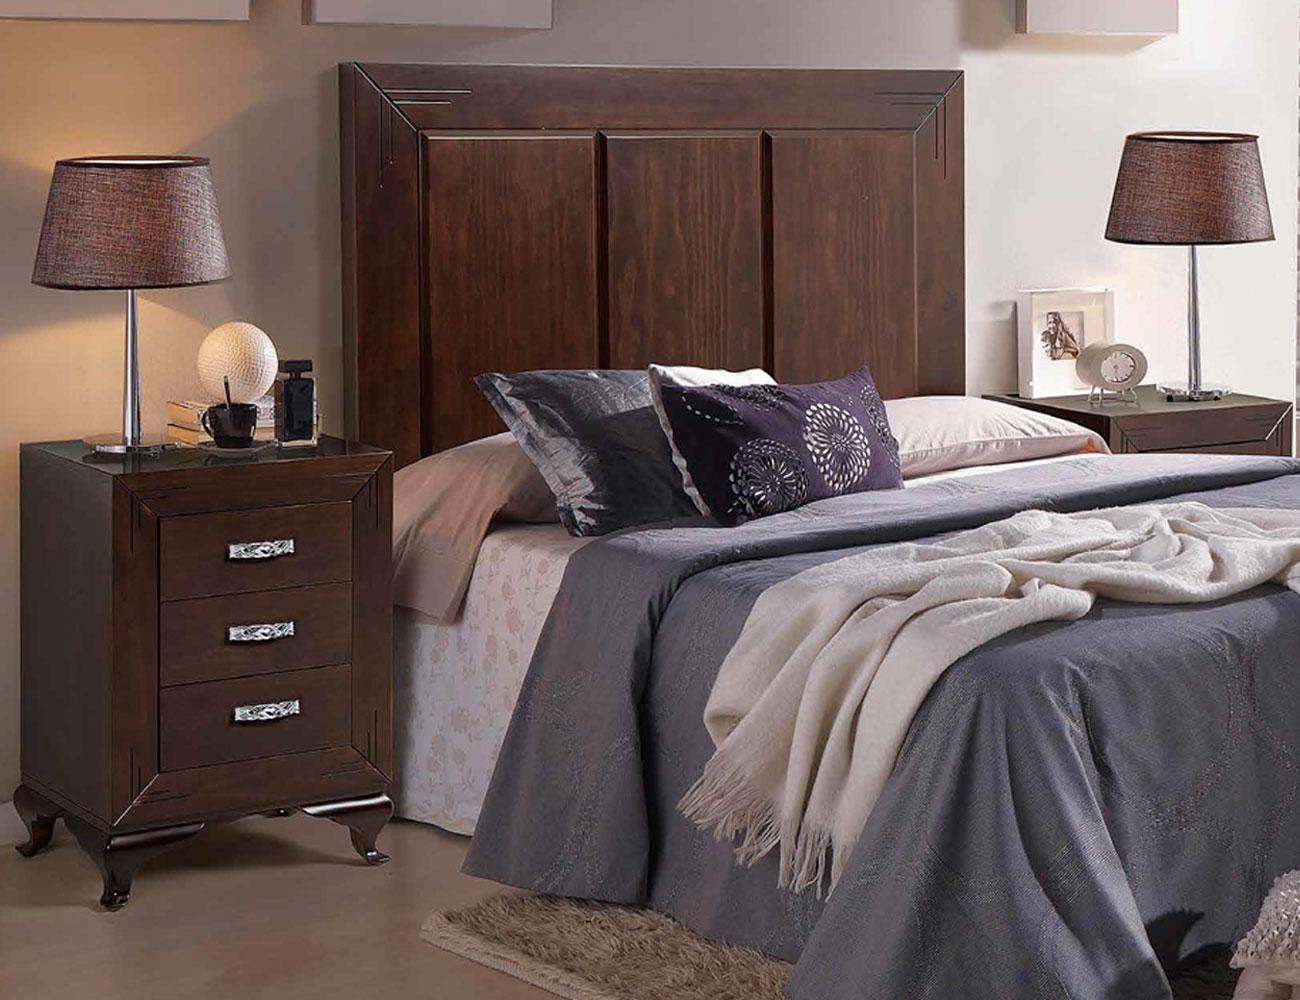 Composicion06 dormitorio matrimonio detalle